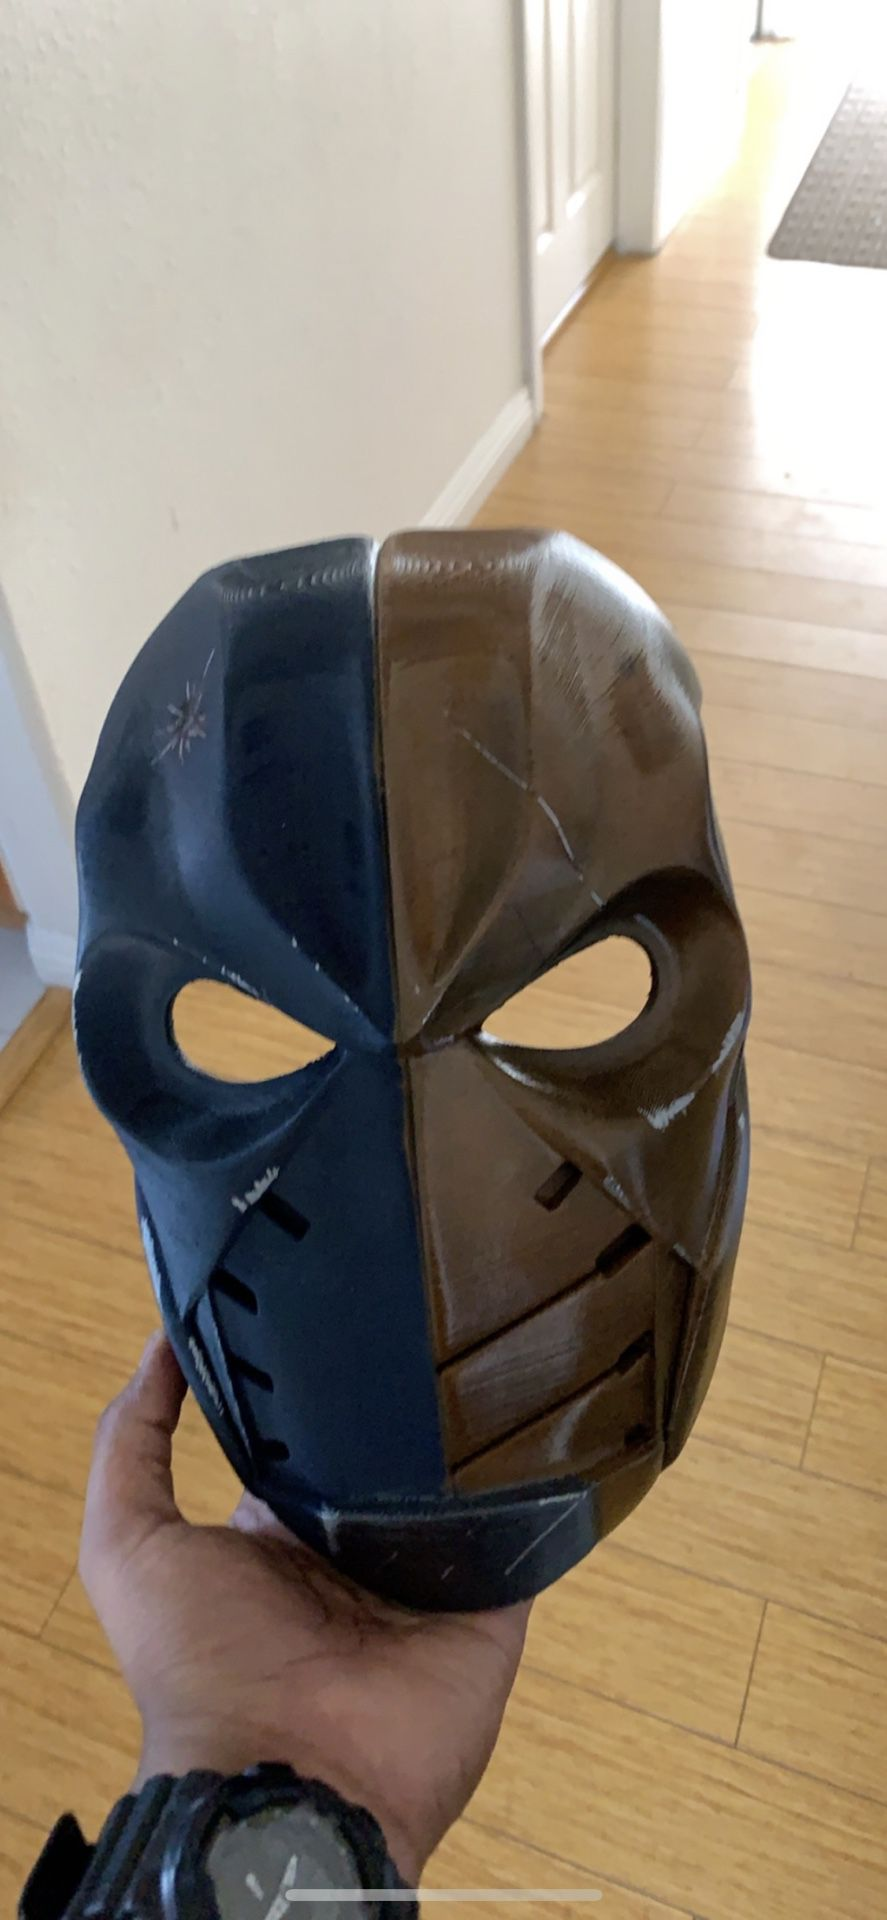 Deathstroke Titans mask